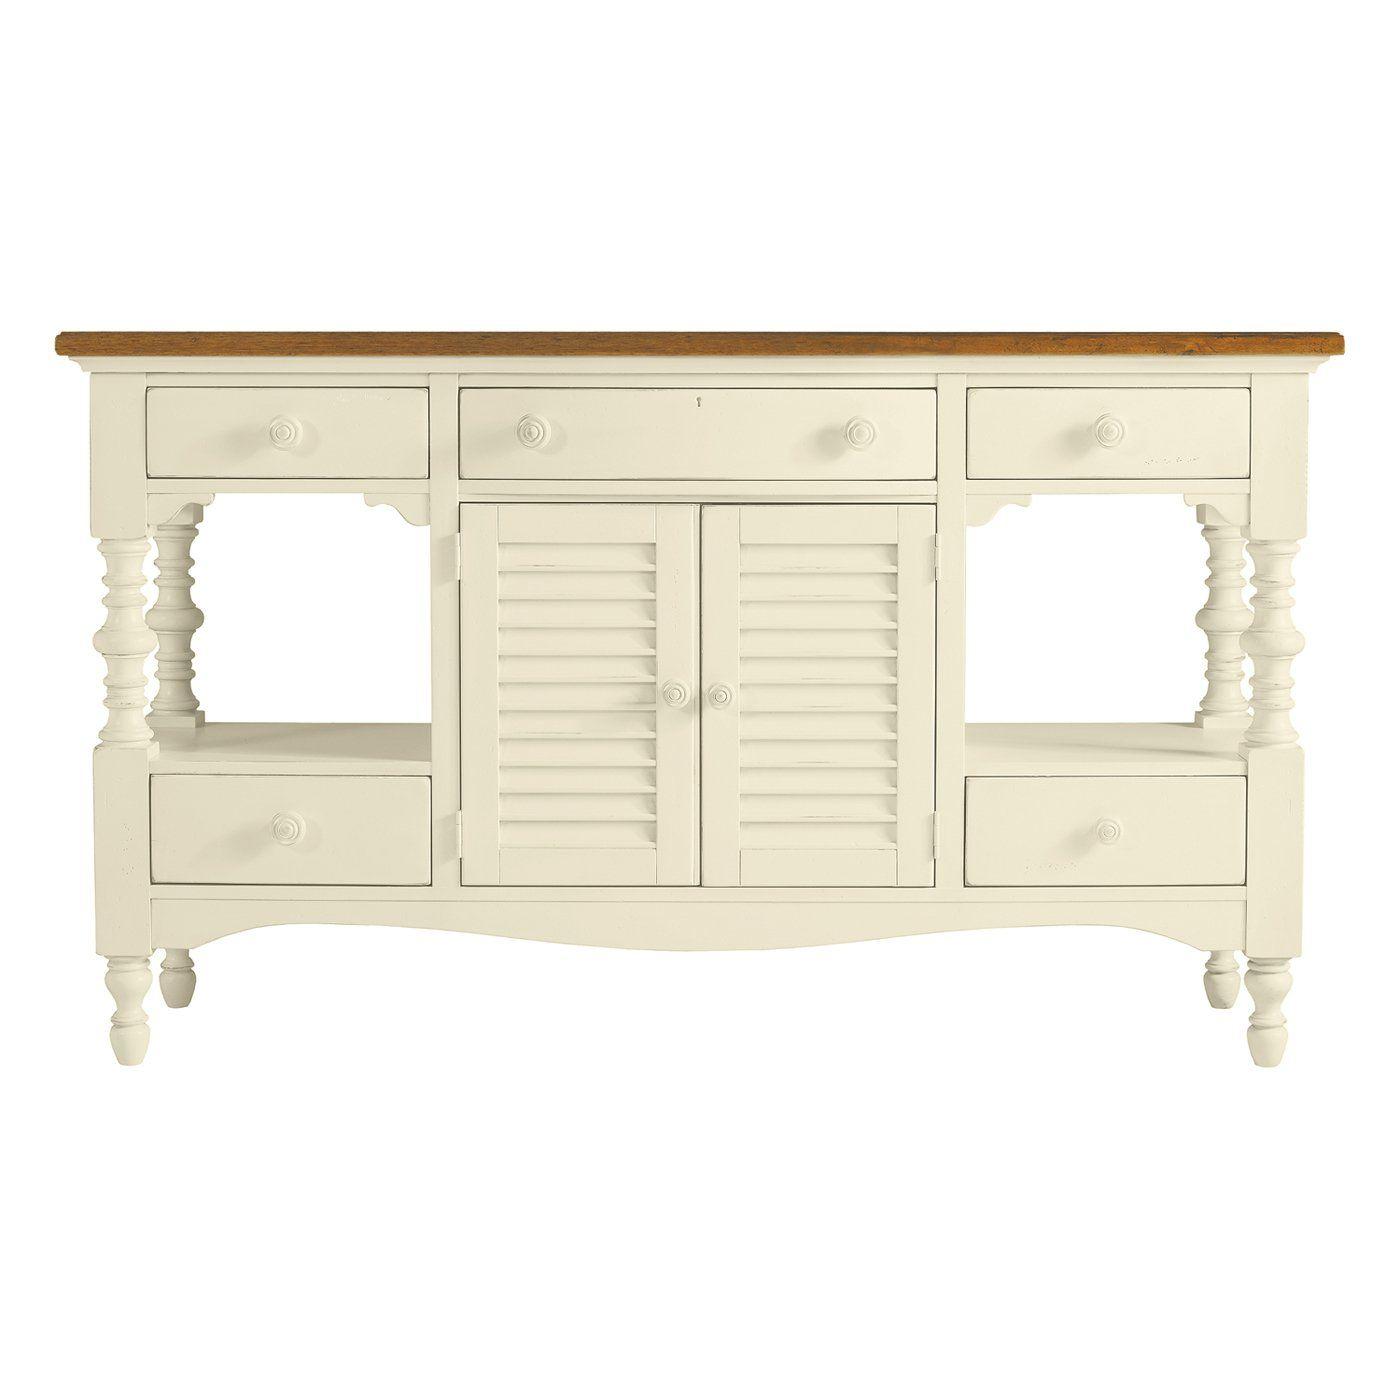 Stanley Furniture 829 Coastal Living Buffet Sideboard